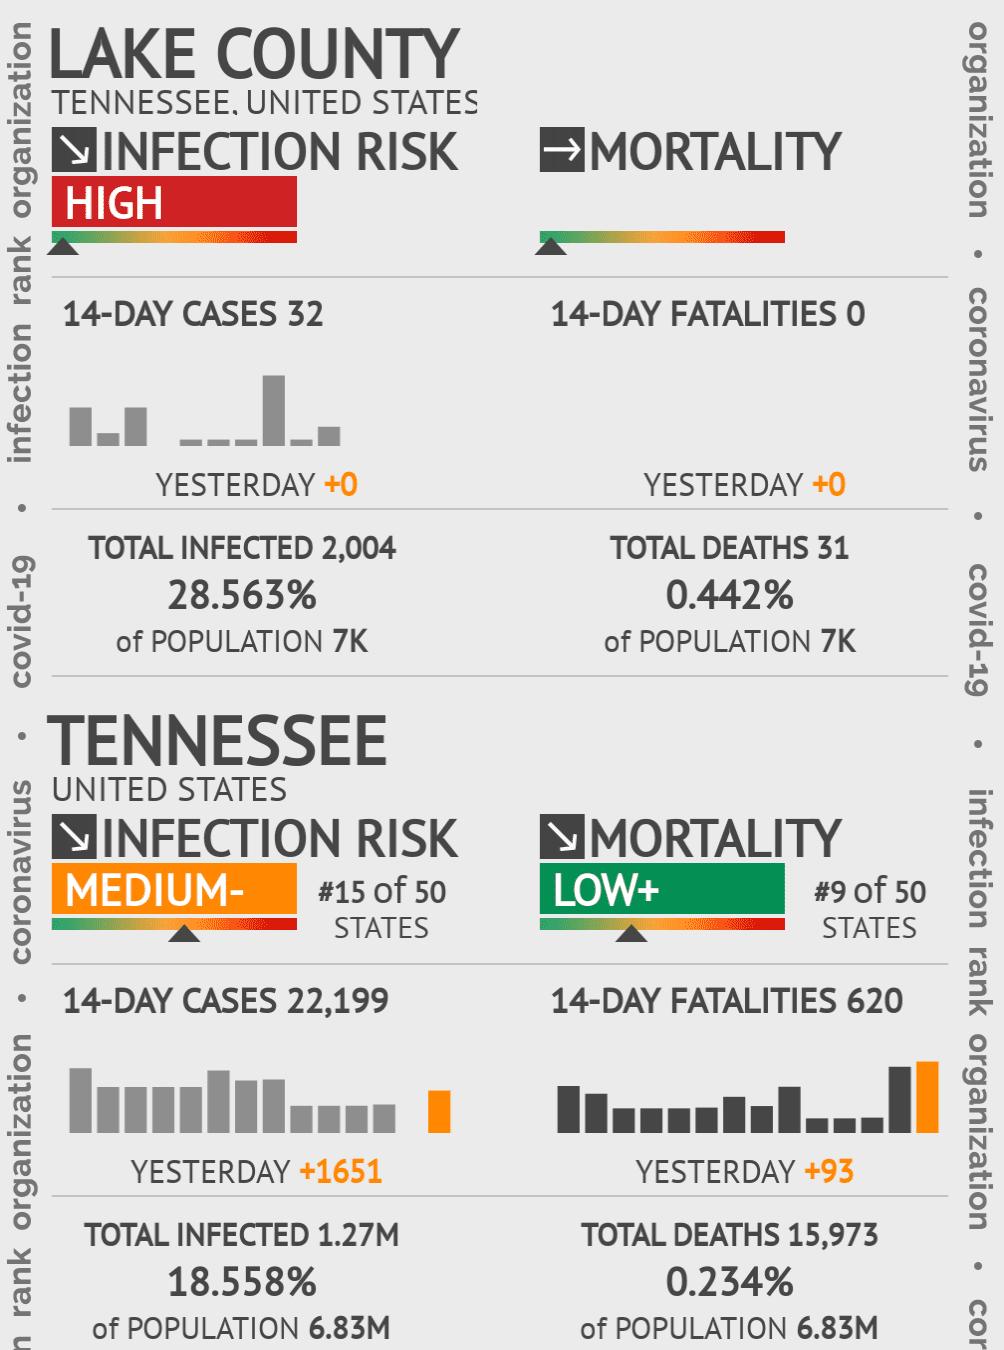 Lake County Coronavirus Covid-19 Risk of Infection on January 15, 2021